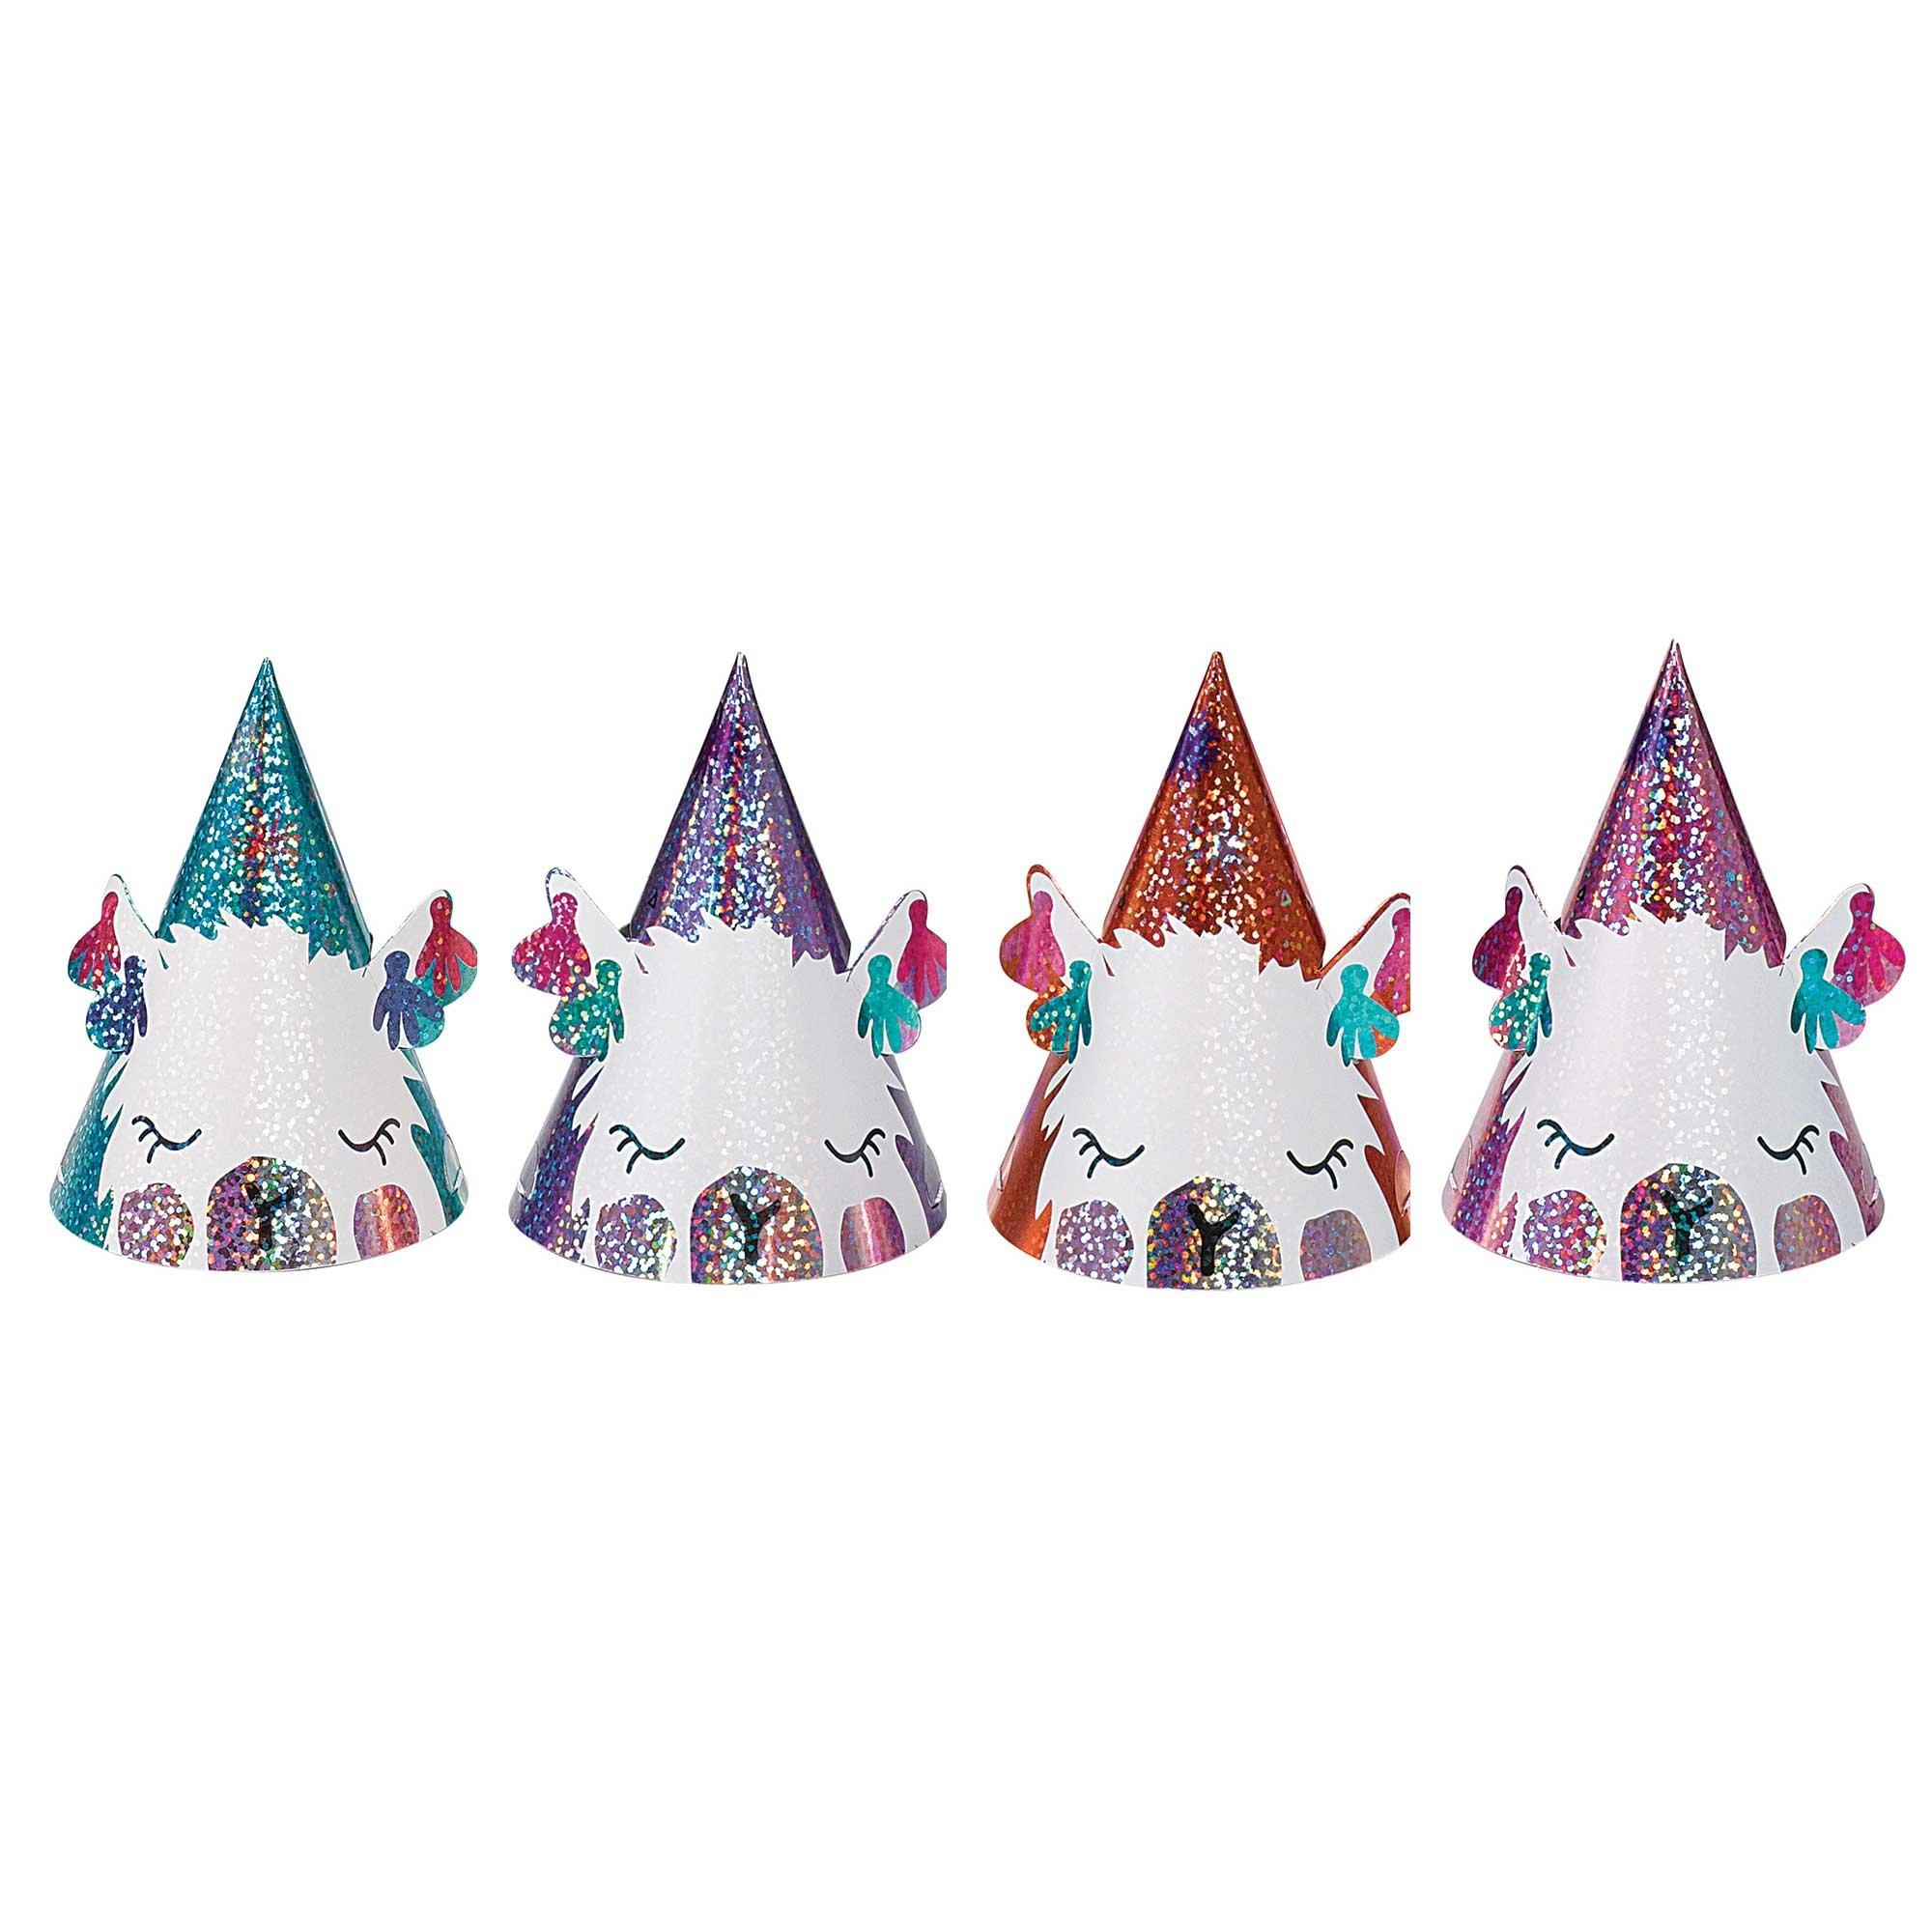 Llama Fun Mini Party Foil Cone Hats